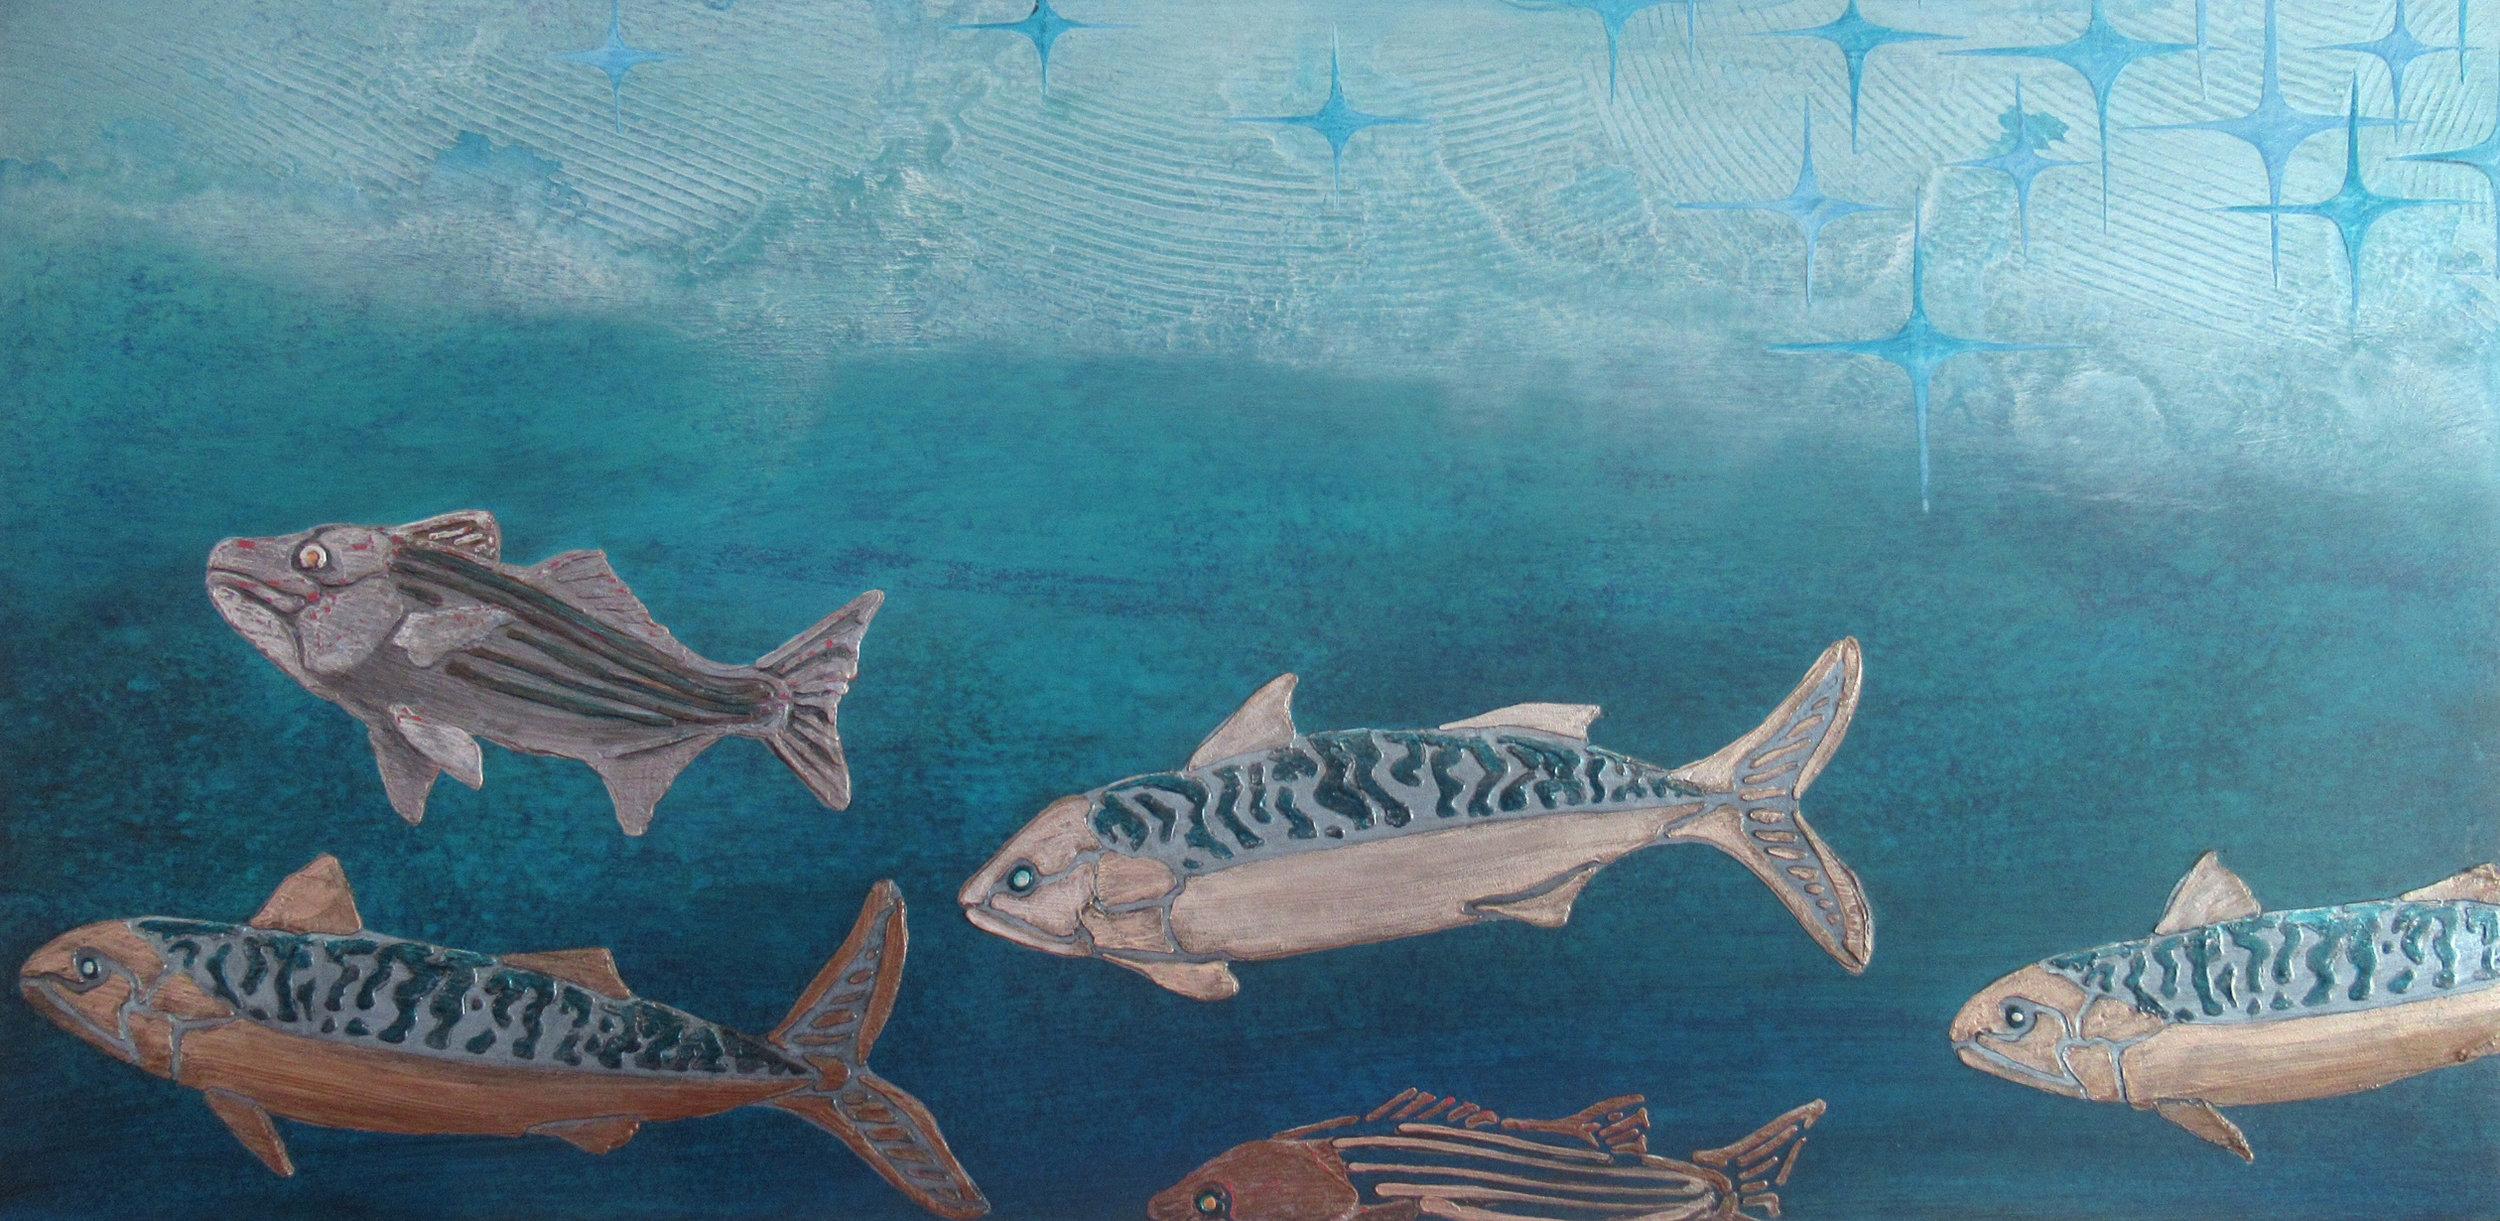 Stripers and Mackerel - Shimmer • Penobscot